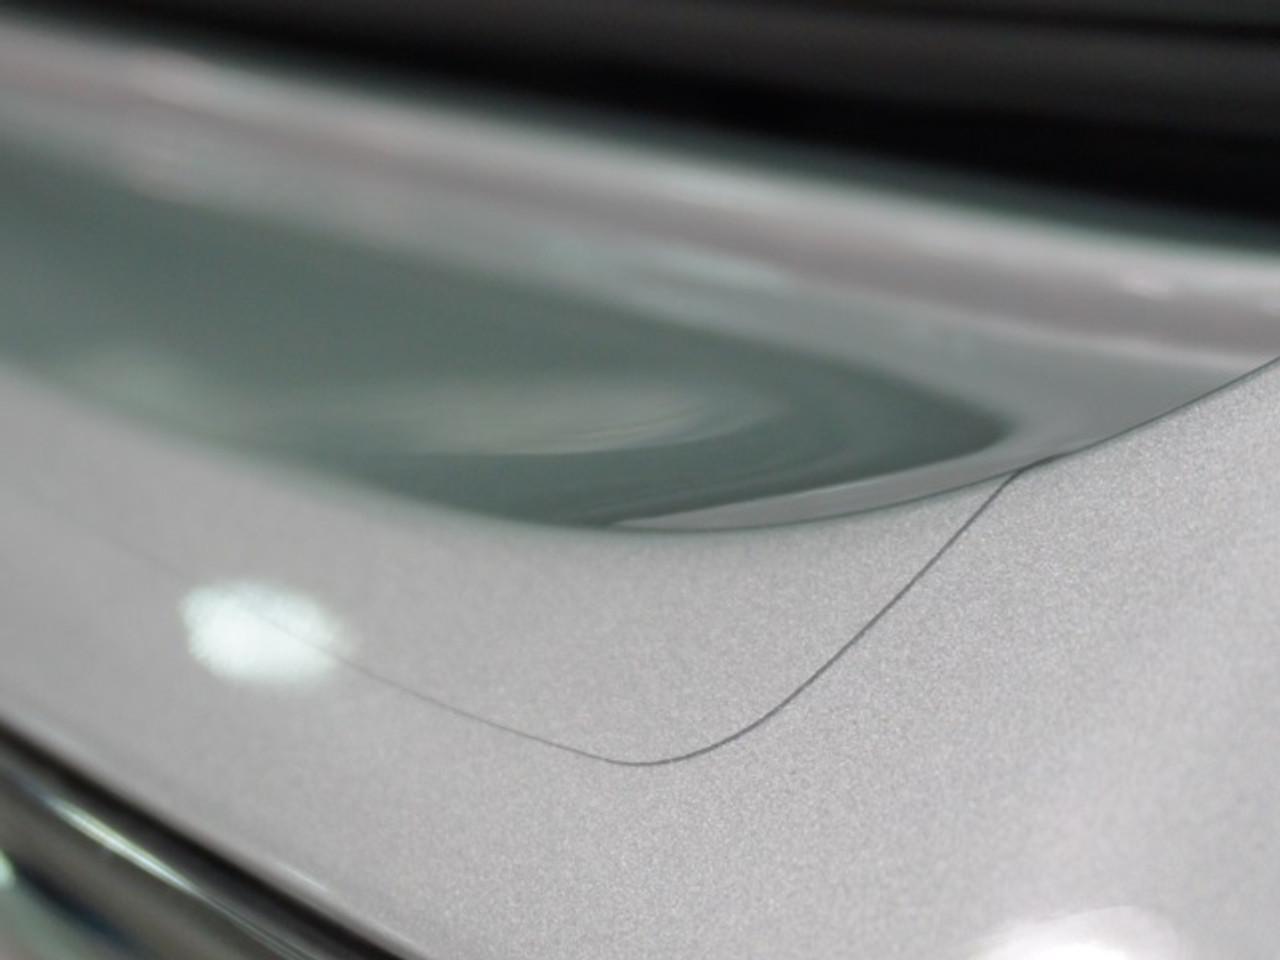 VW Golf Rear Bumper Protector Film